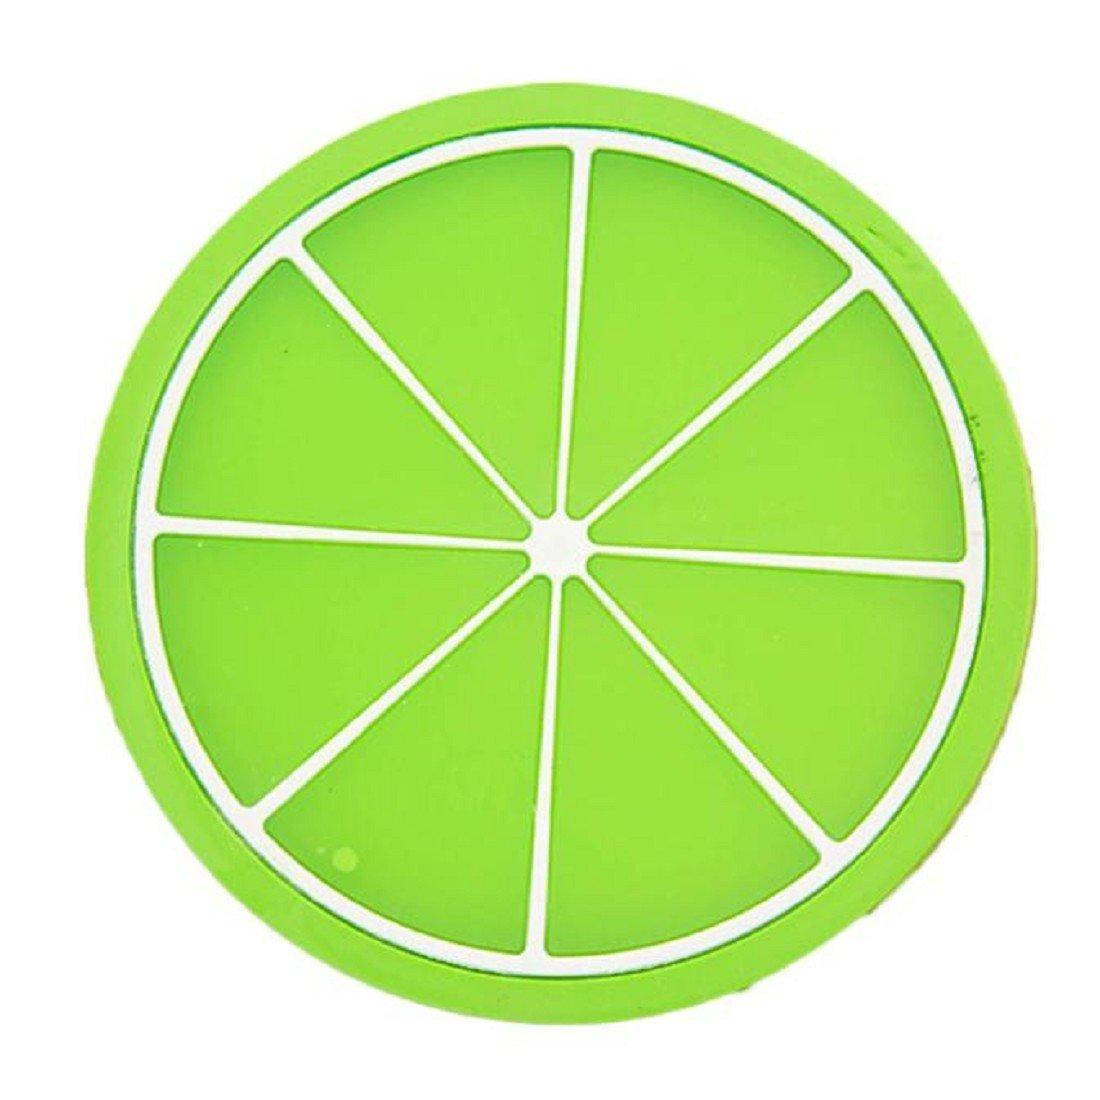 Silicone Coasters - Green